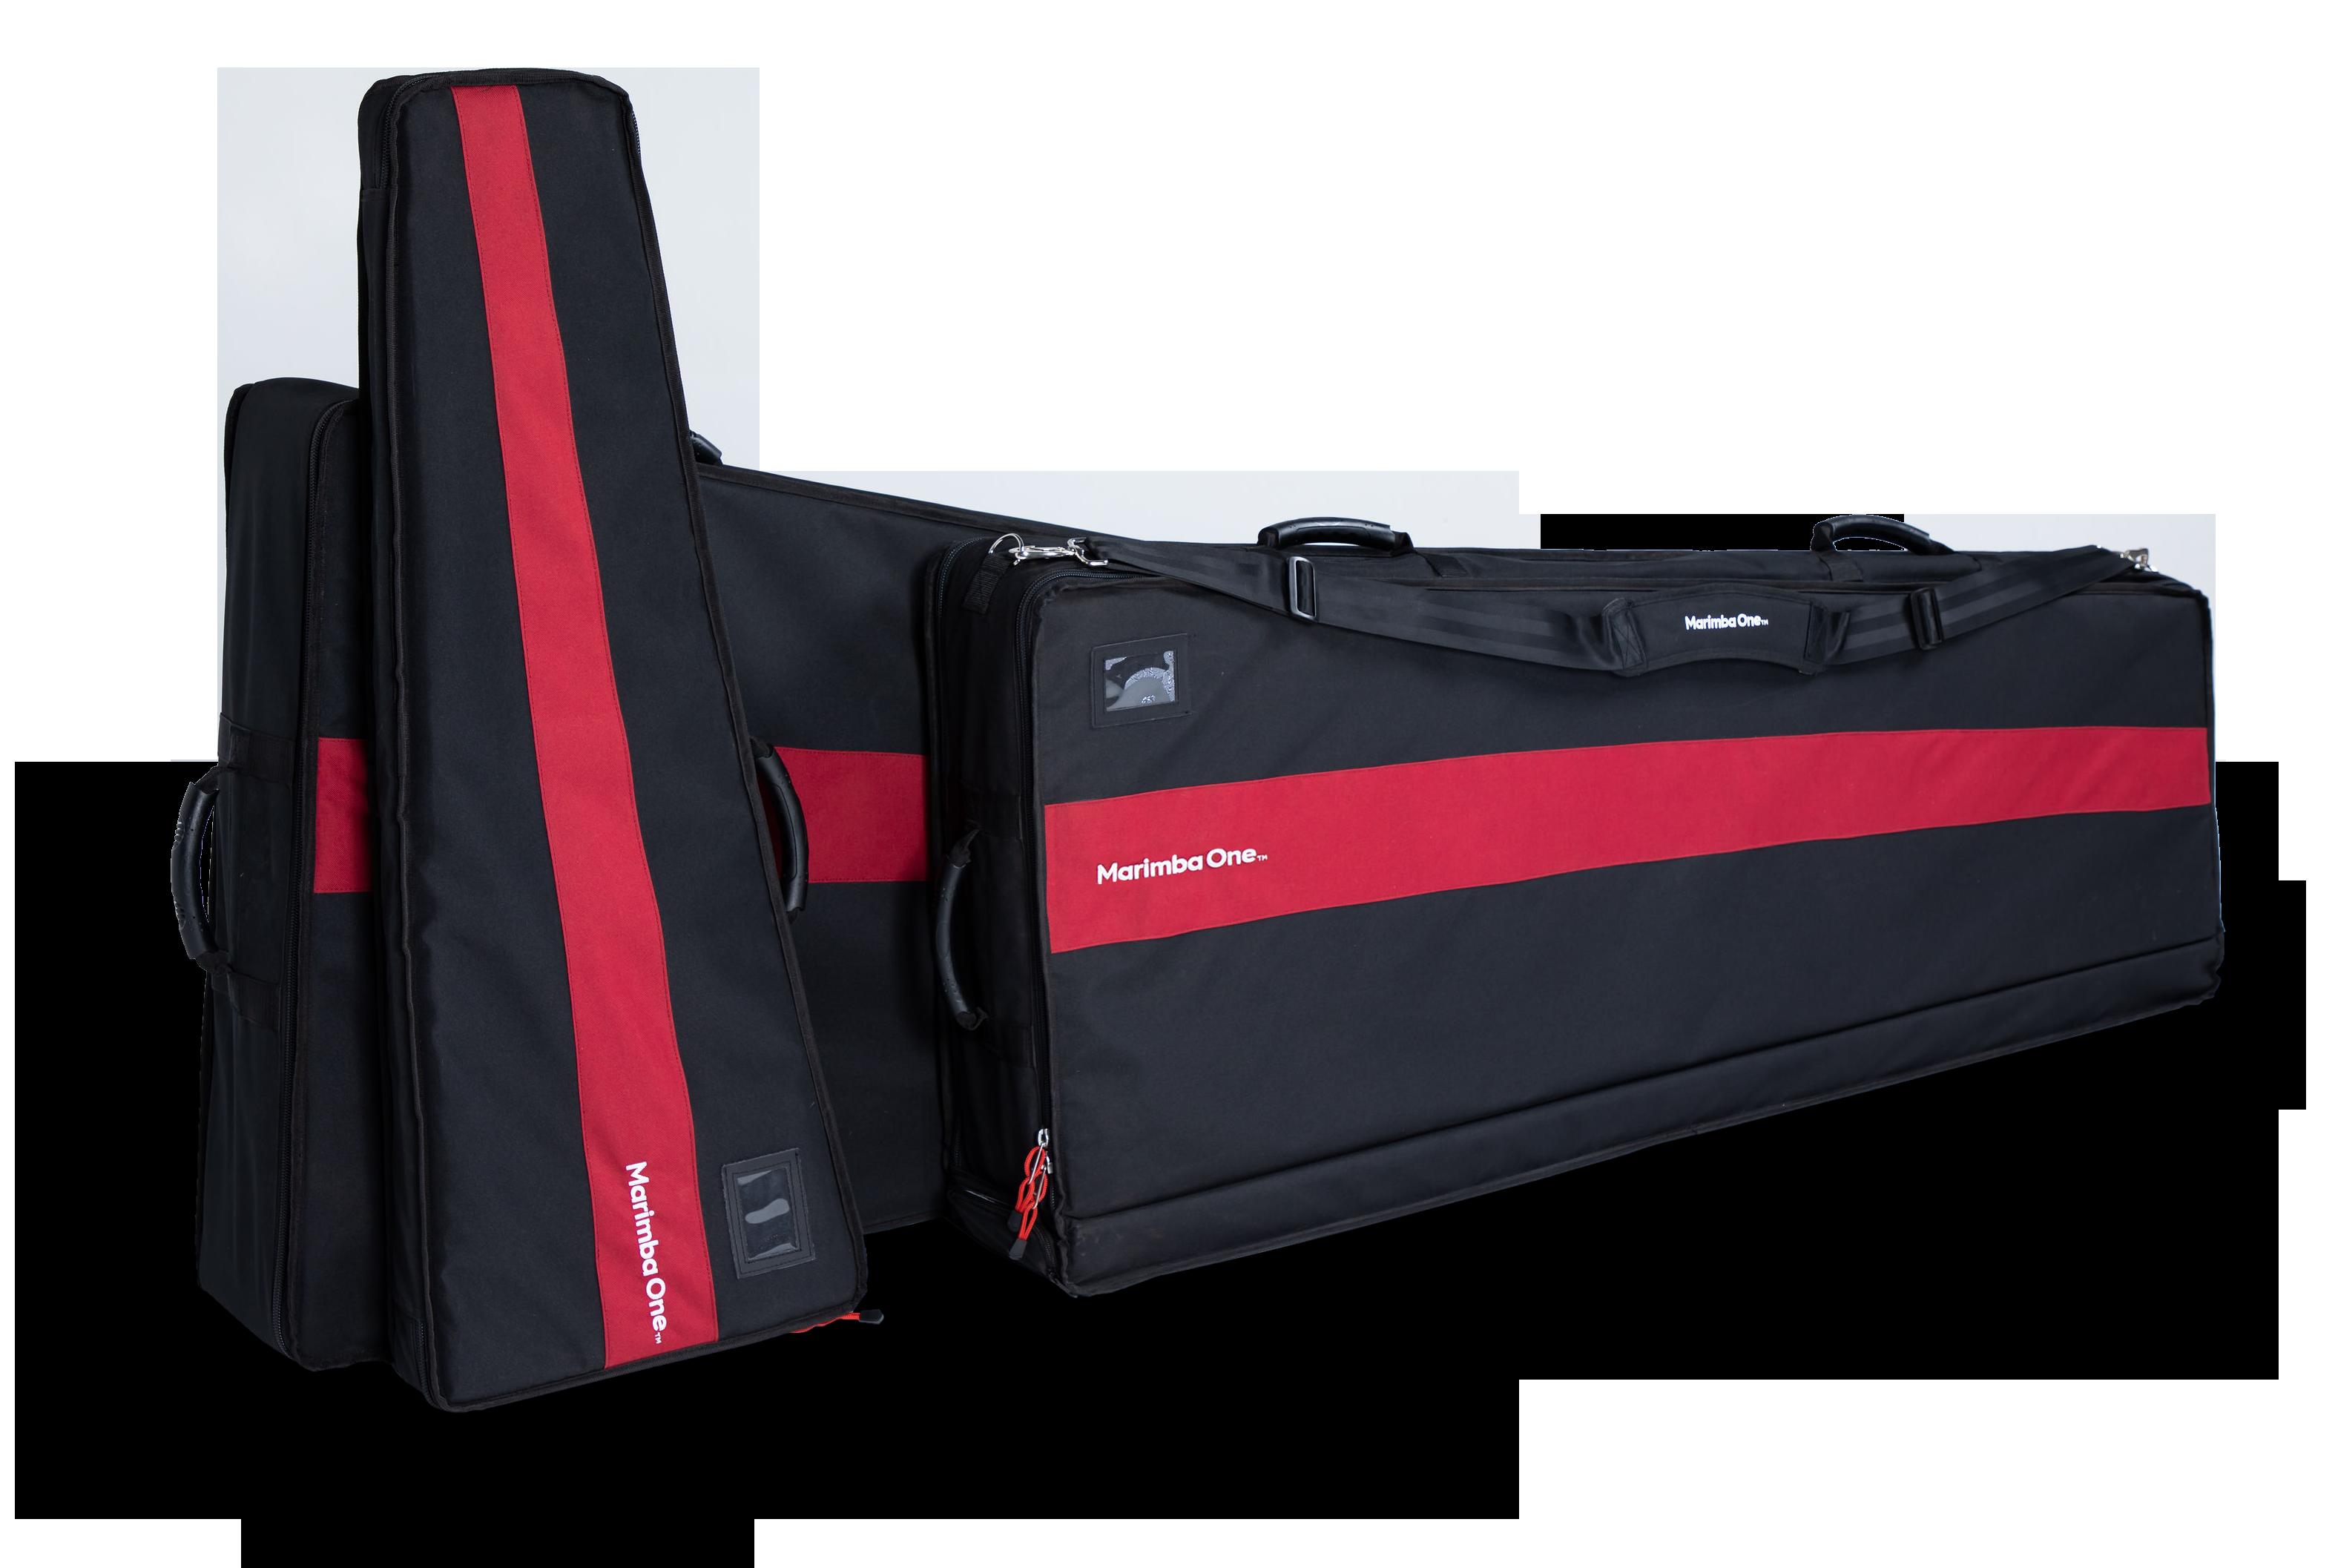 Vibraphone Cases